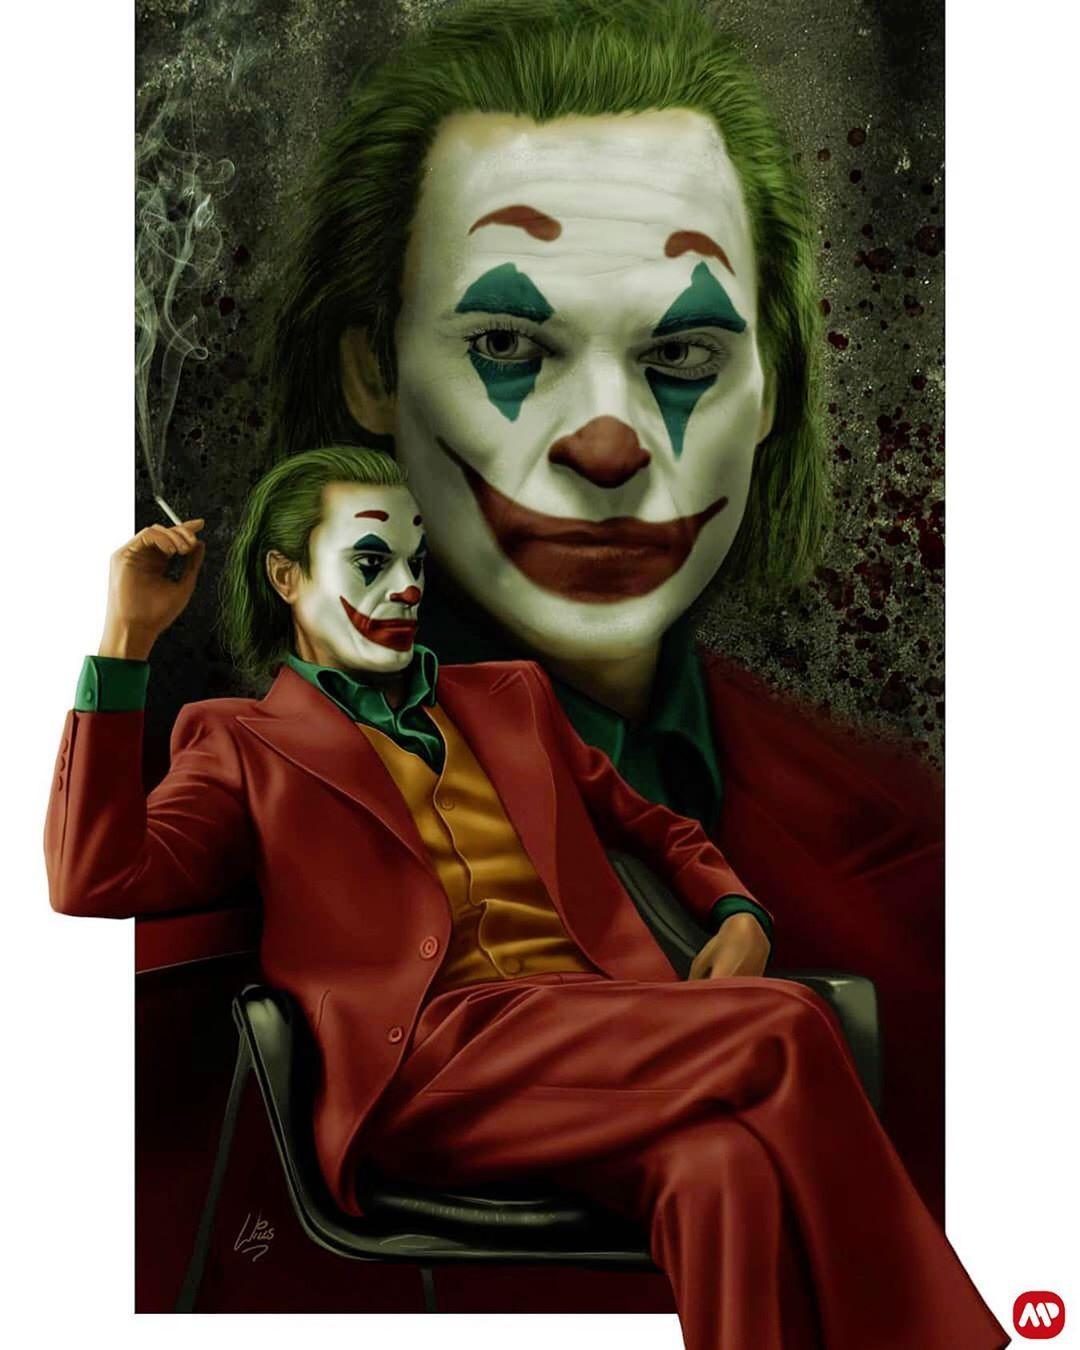 Pin on † Villain Dual The Joker ♠ ️♦️ & His Villainess